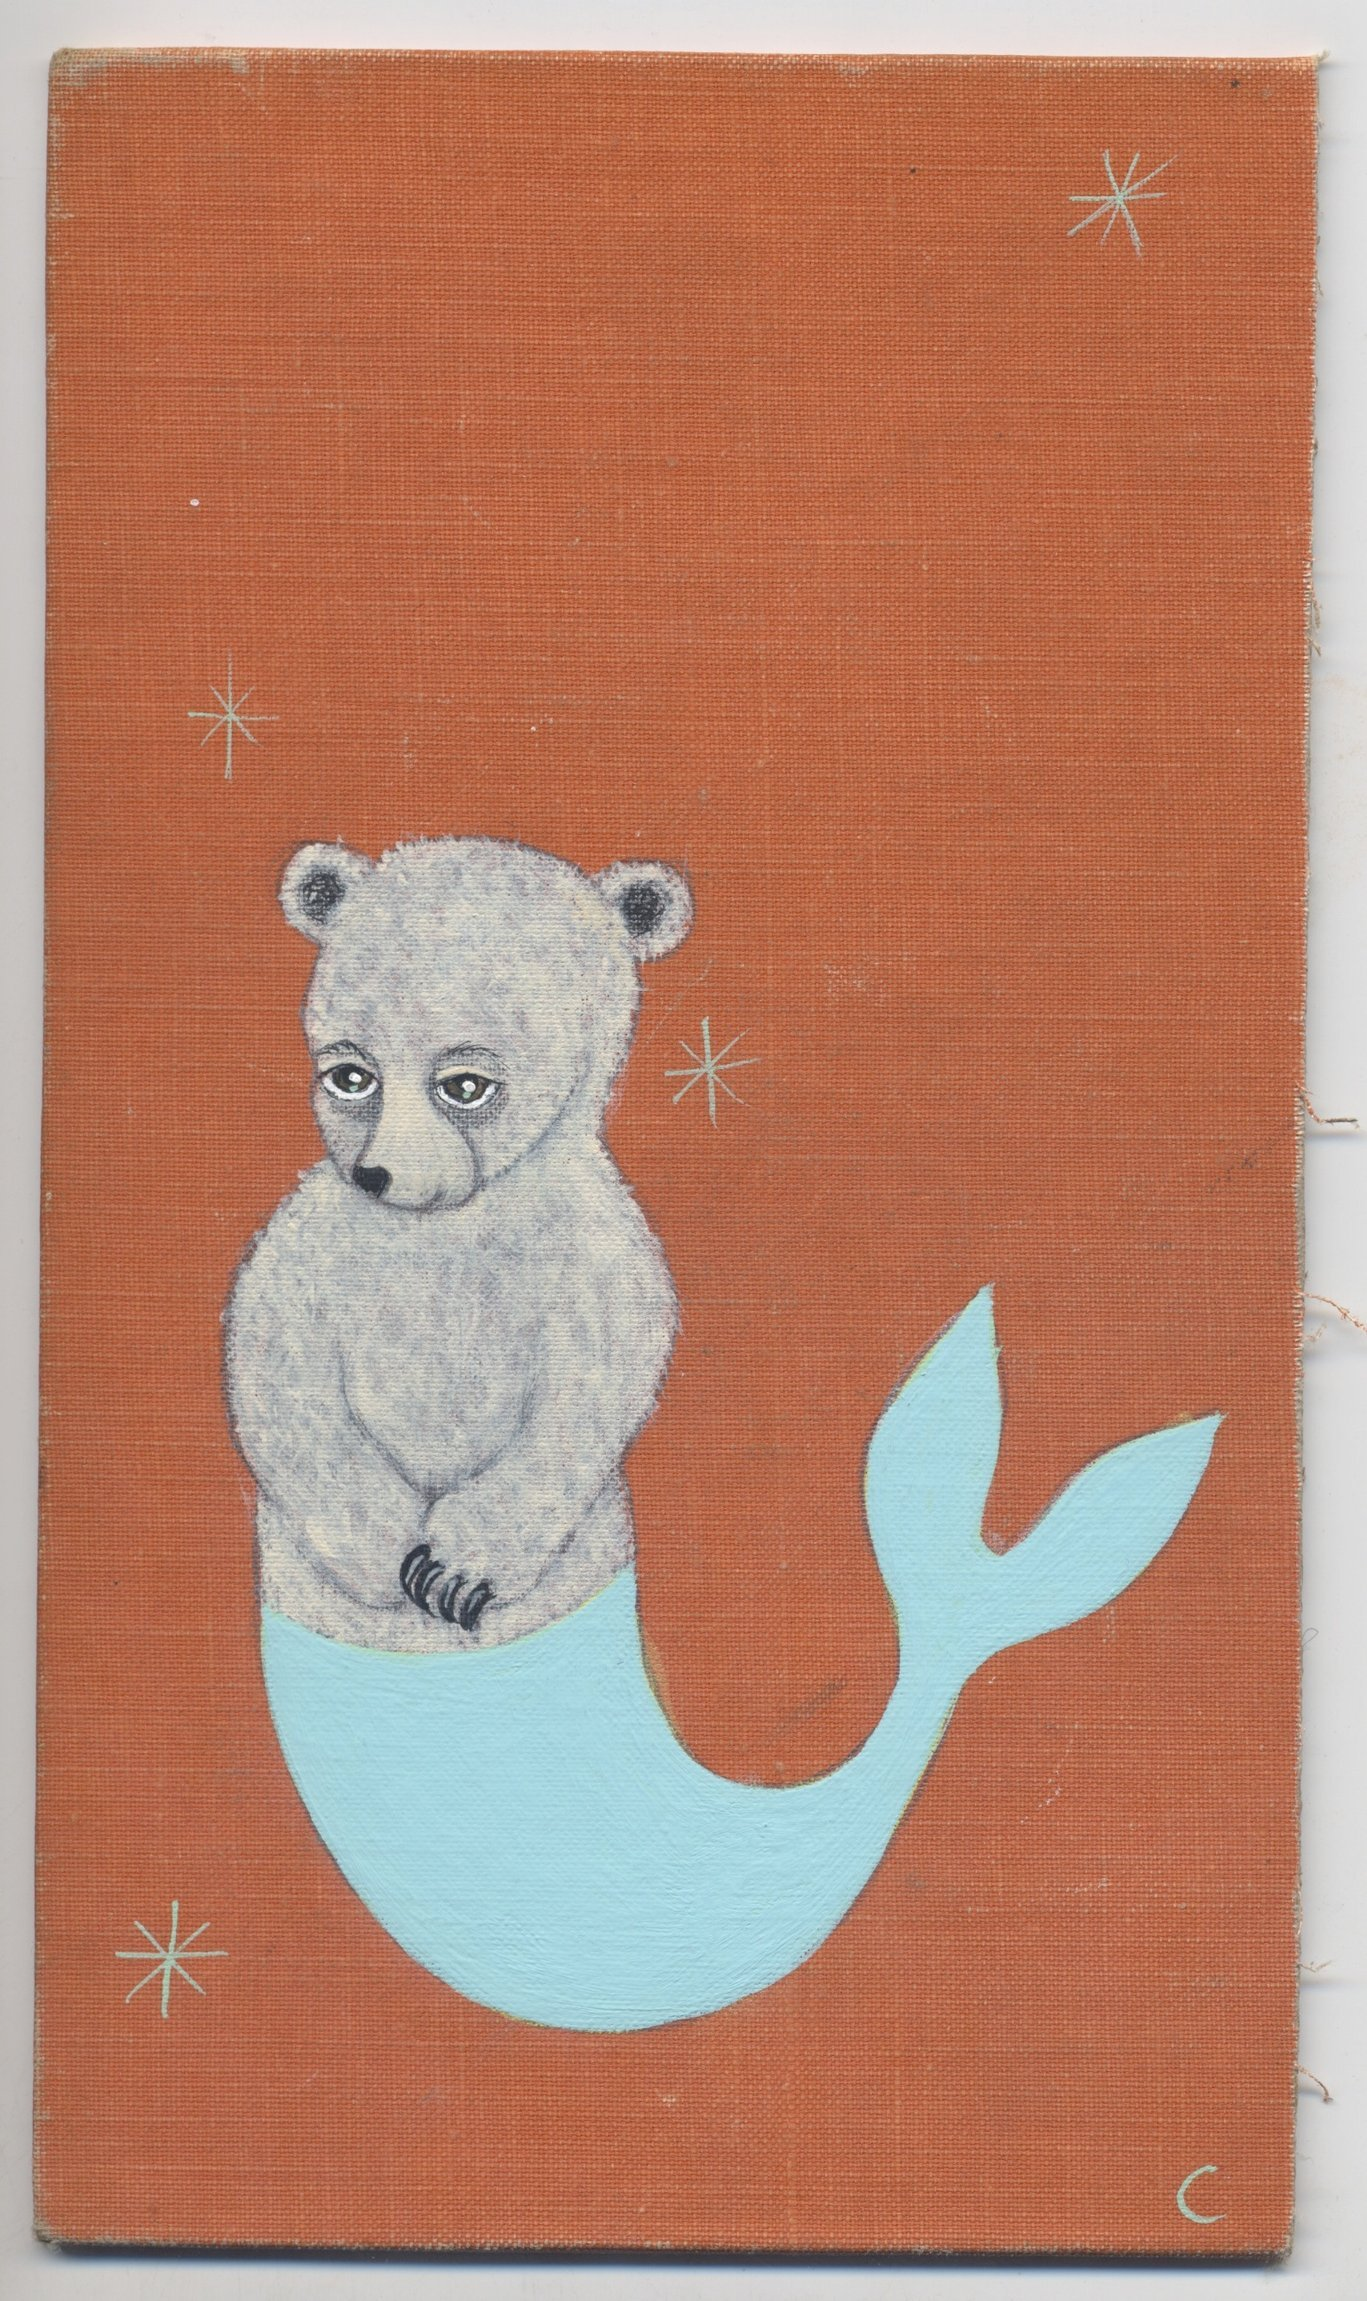 Merbear  Chapter 5 (2014)